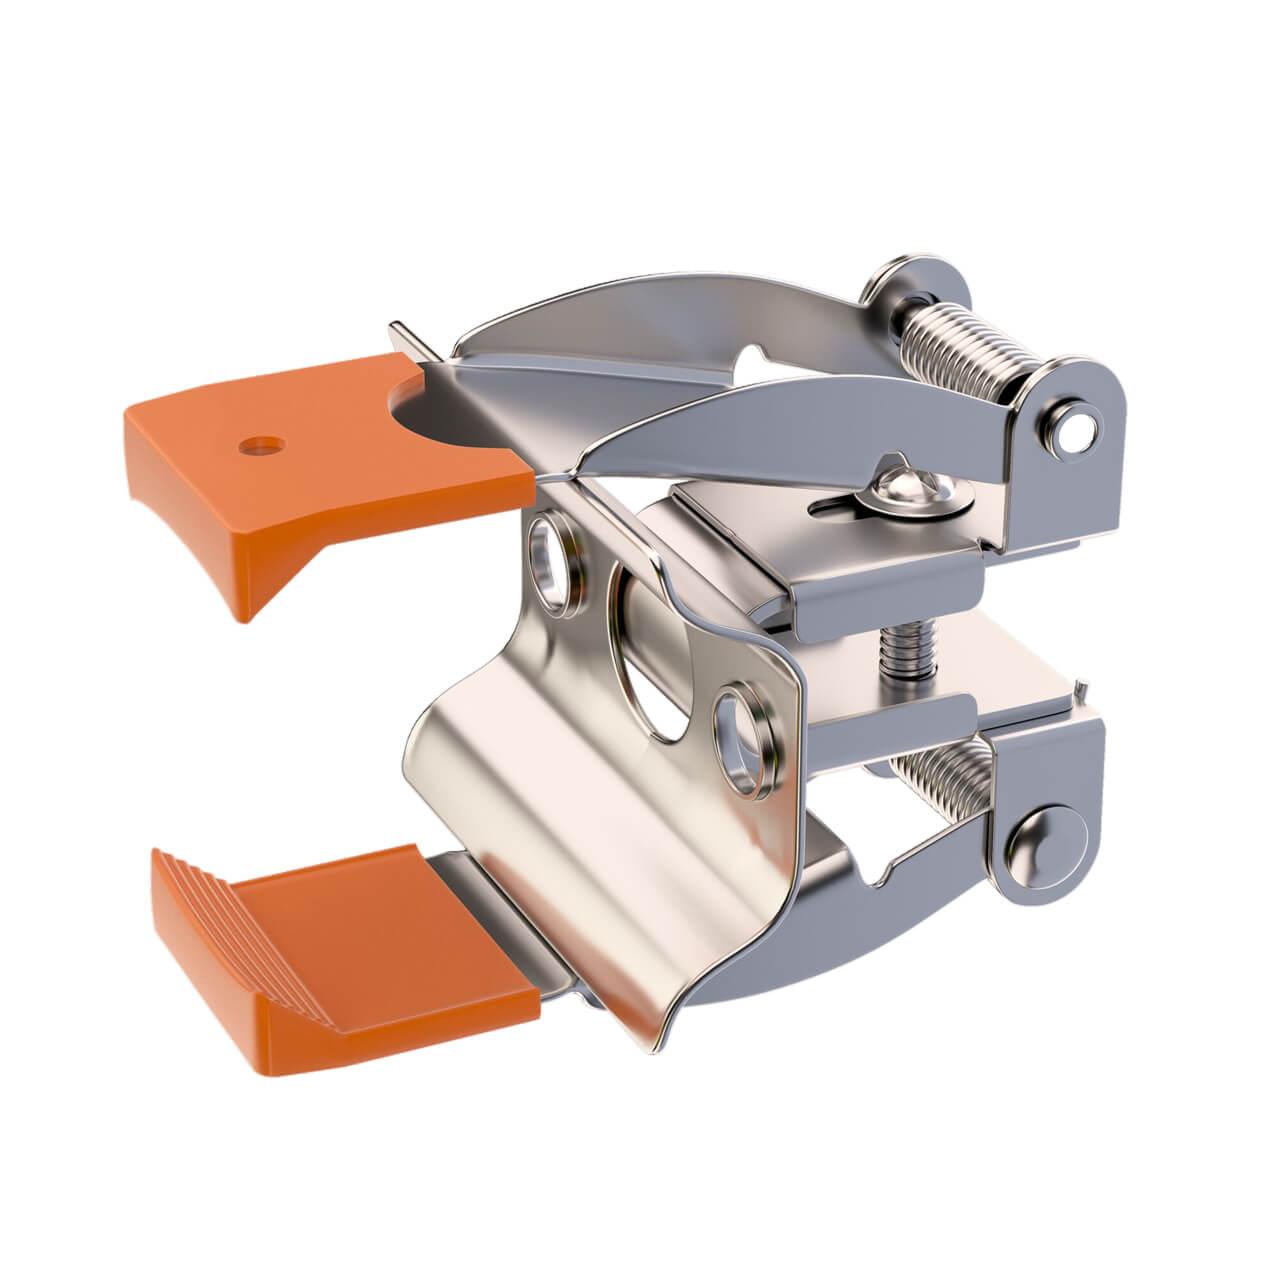 Фото - Держатель шинопровода Maytoni TRA002HR-11B Accessories for trac (для однофазного шинопровода) trac